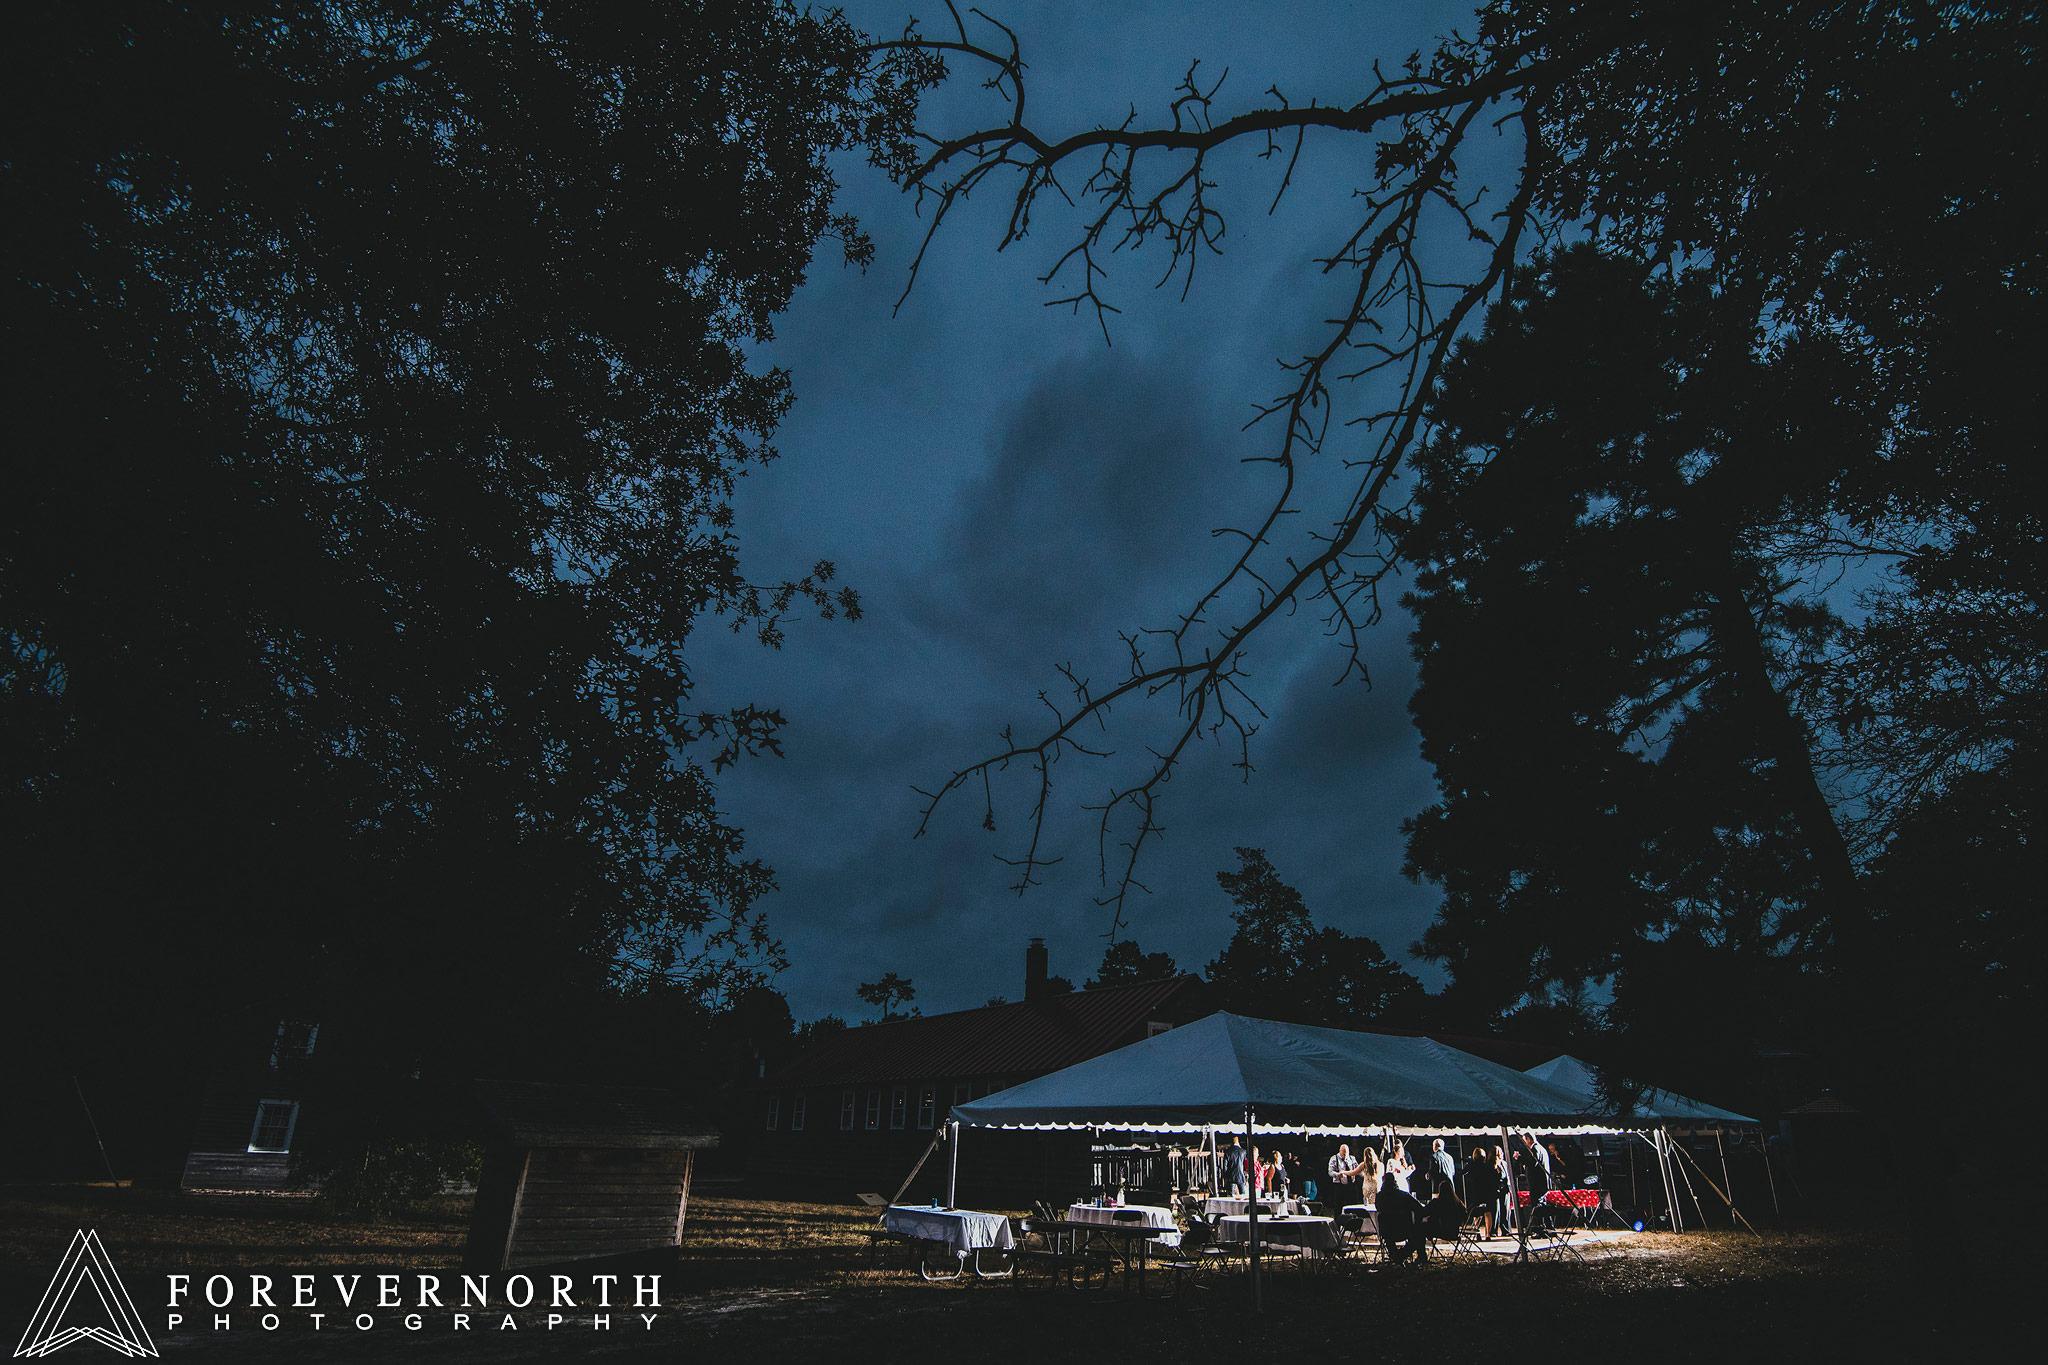 Perkins-Whitesbog-Village-Wedding-Photographer-32.JPG